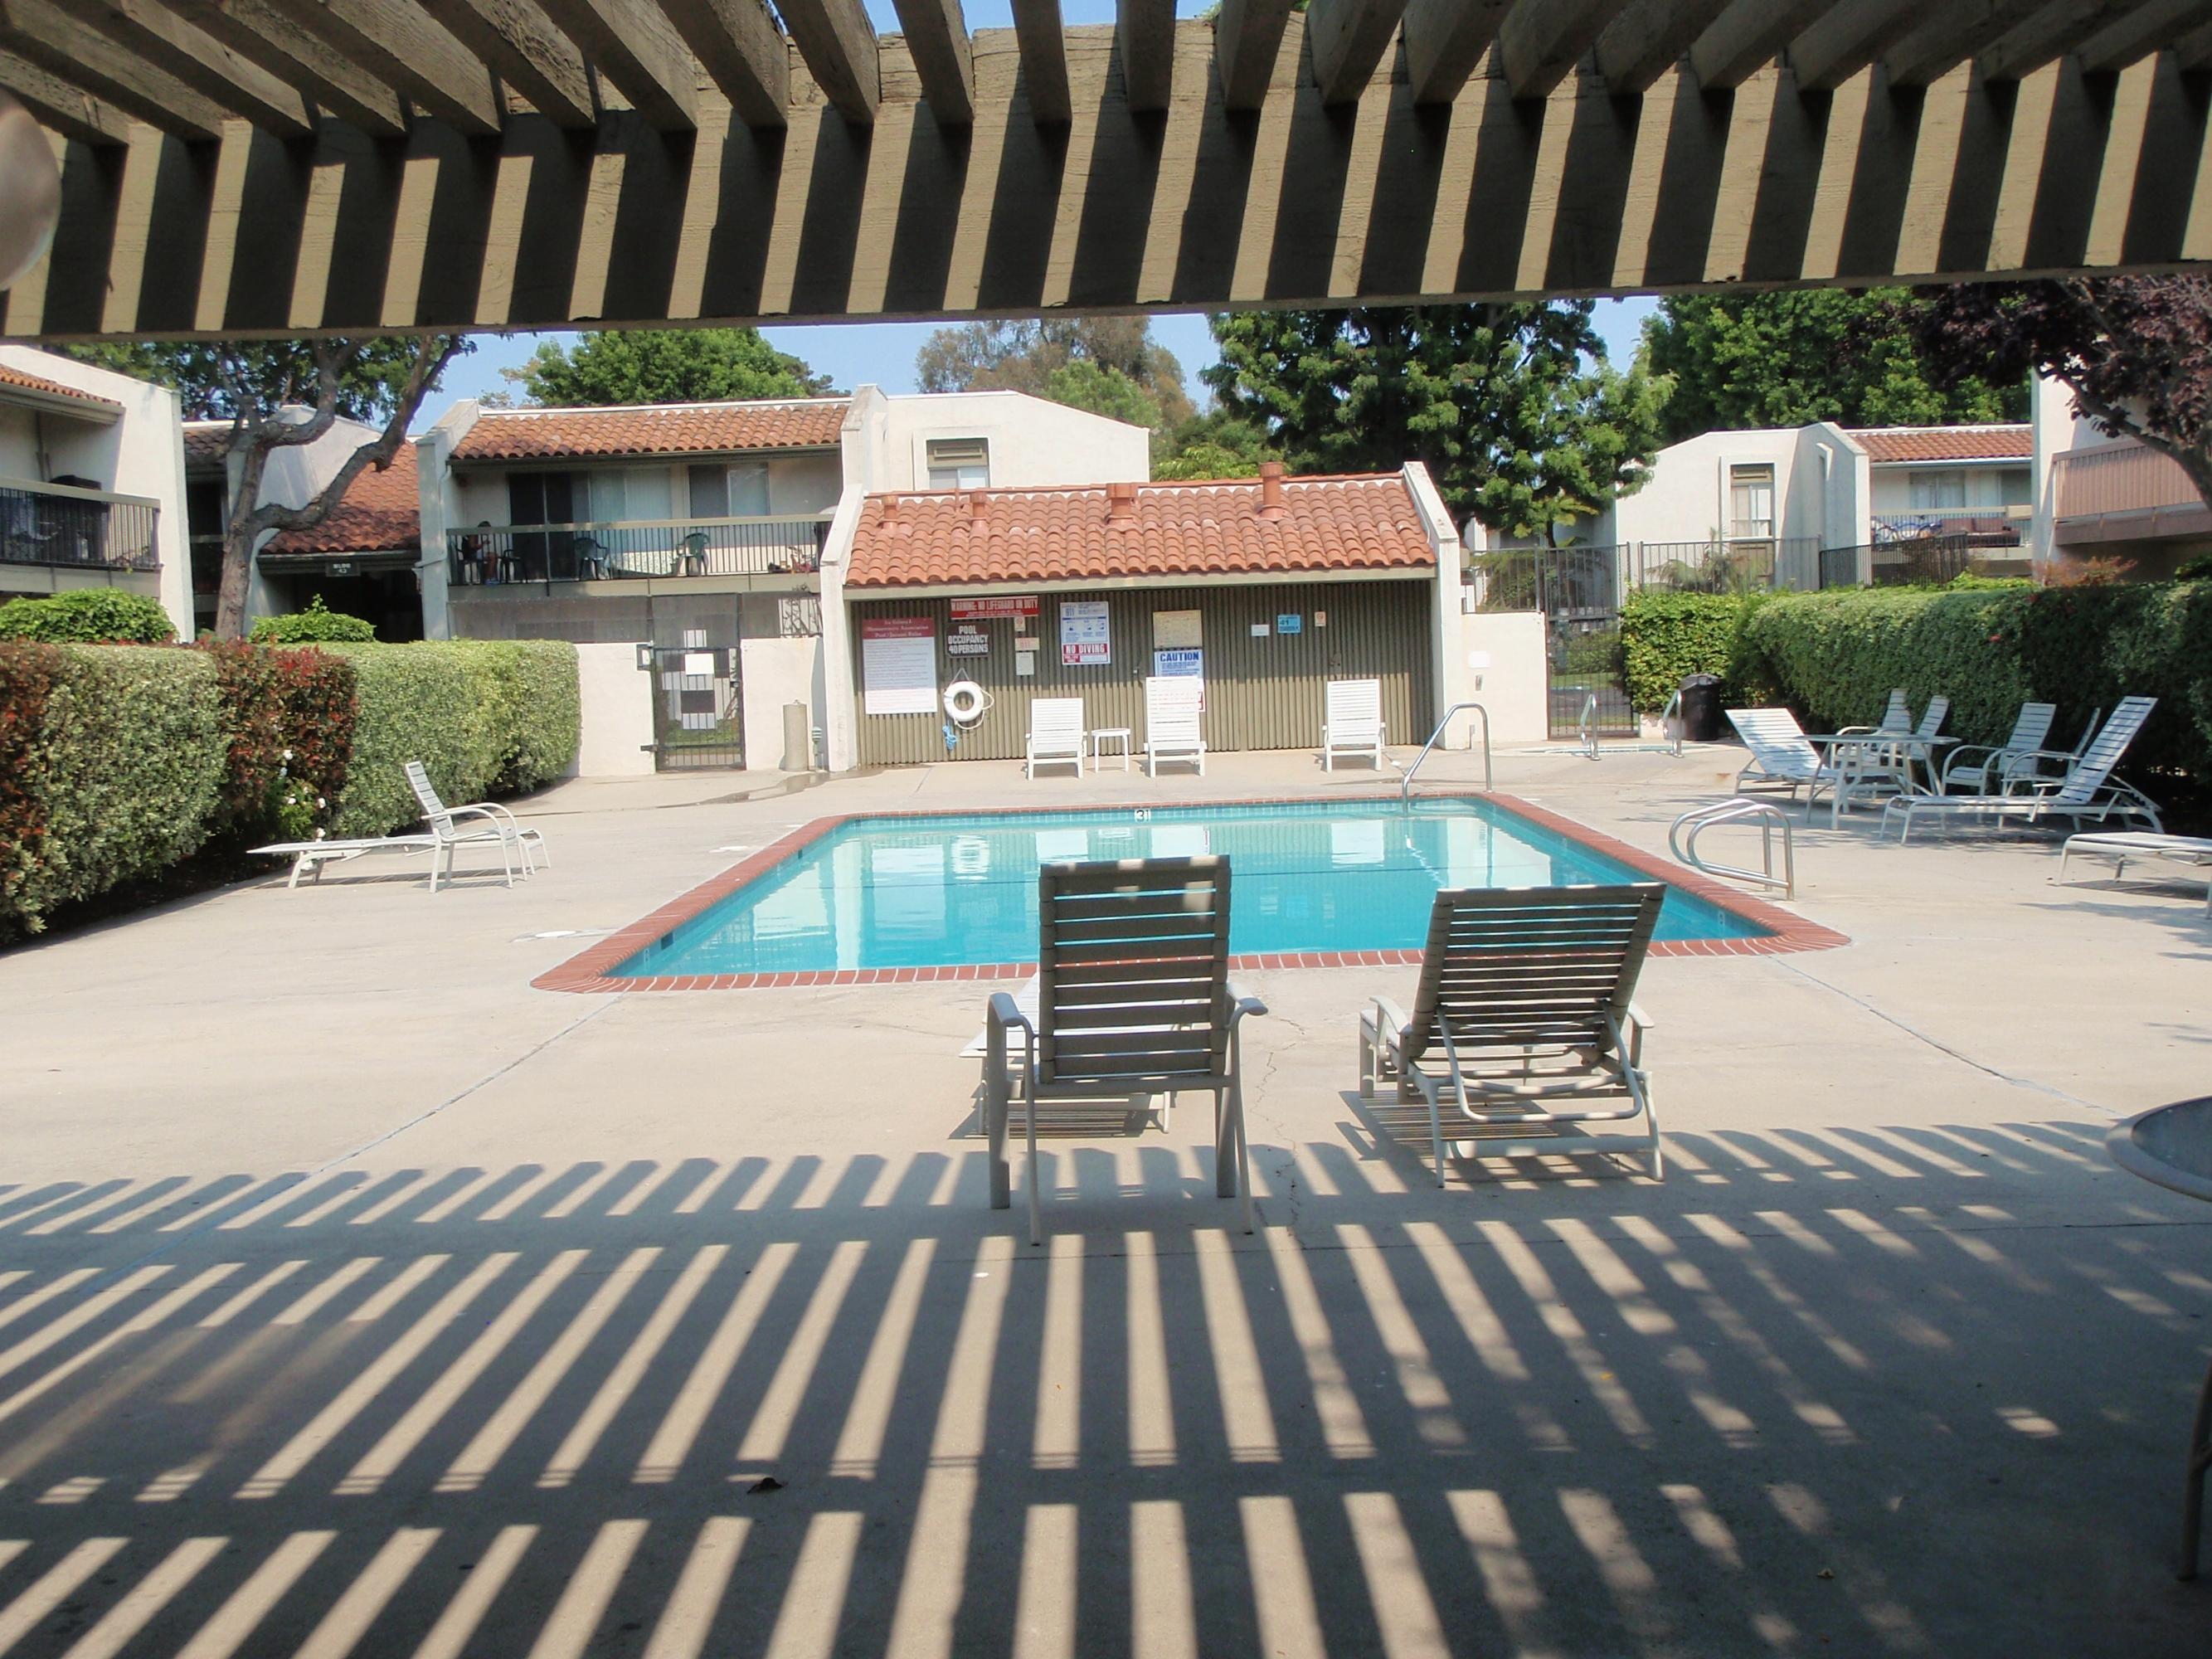 Property photo for 41 Dearborn Pl #75 Goleta, California 93117 - 13-2401